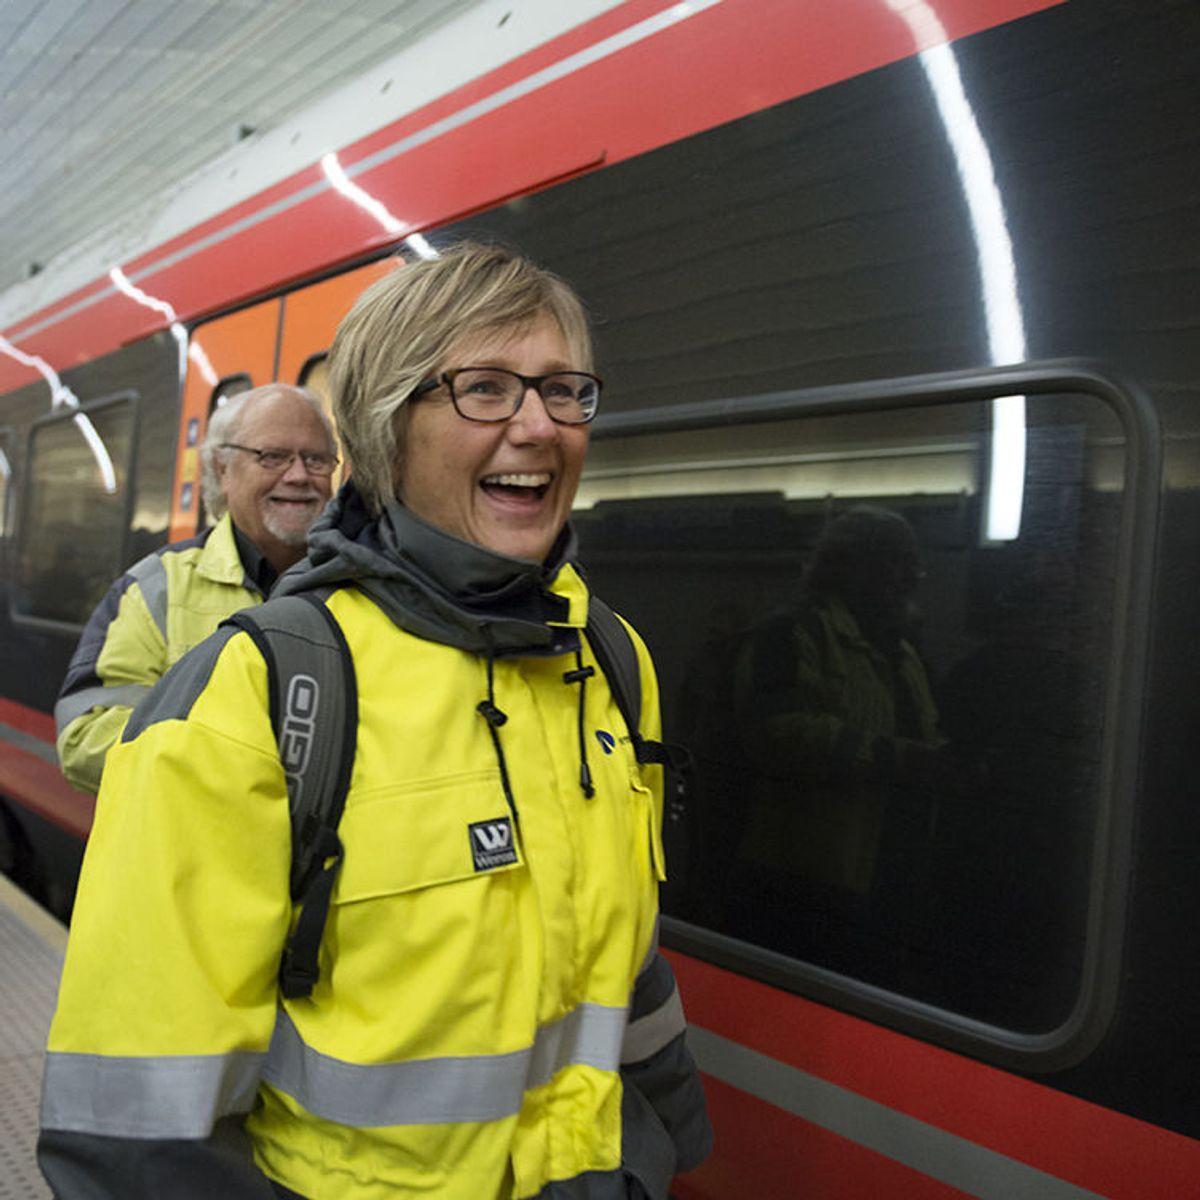 Stine Ilebrekke Undrum og Knut Edmund Knutsen på plattform. Foto: Anne Mette Storvik